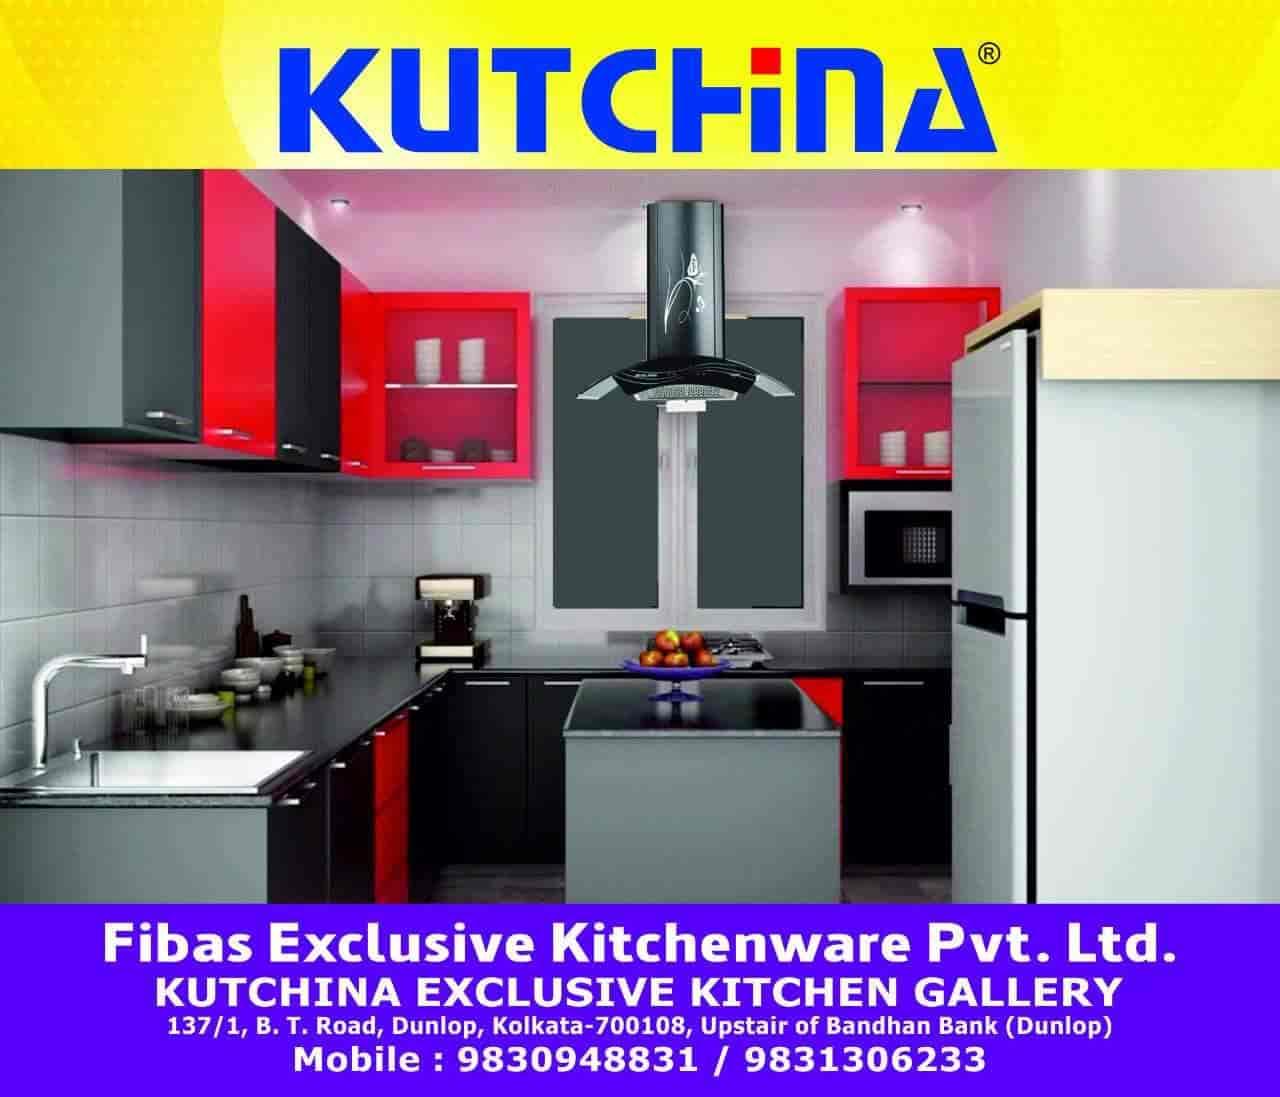 Fibas Exclusive Kitchenware Pvt Ltd